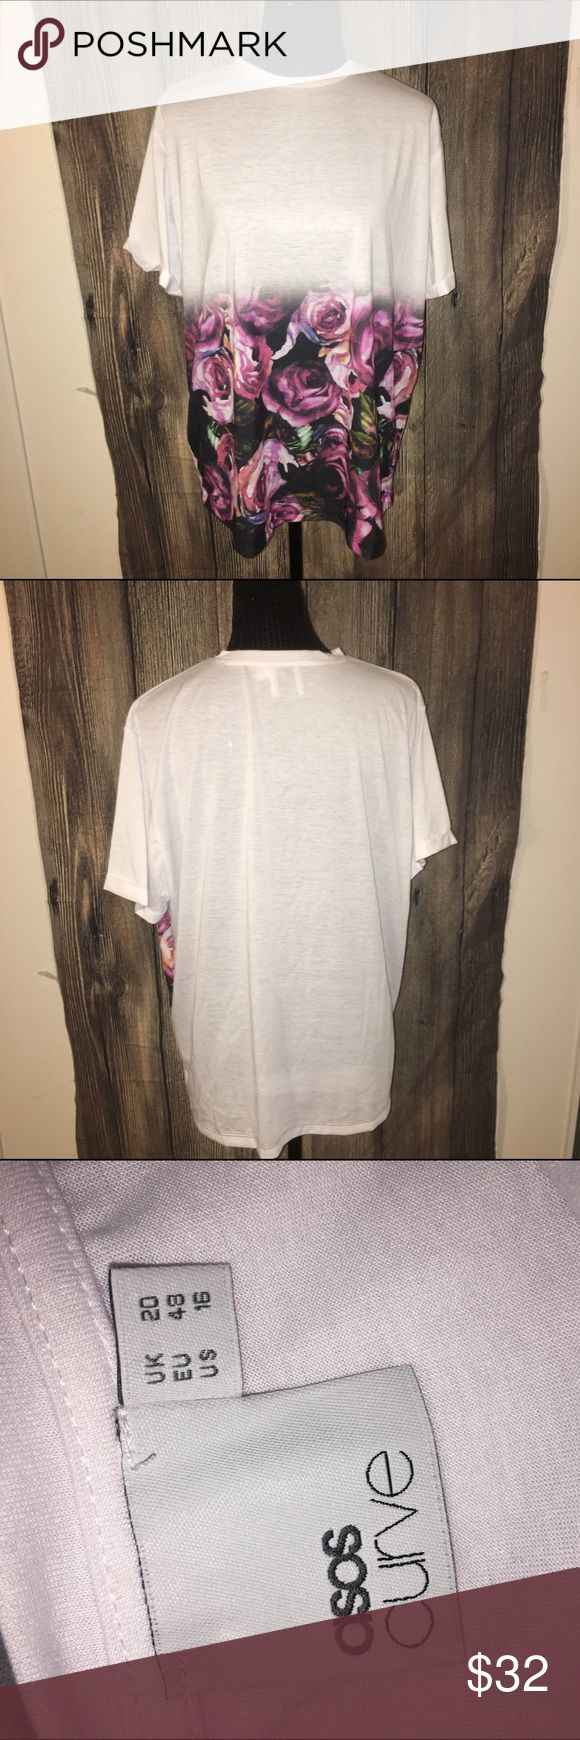 Size 16 floral ASOS curve t shirt So cute ASOS Curve Tops Tees - Short Sleeve